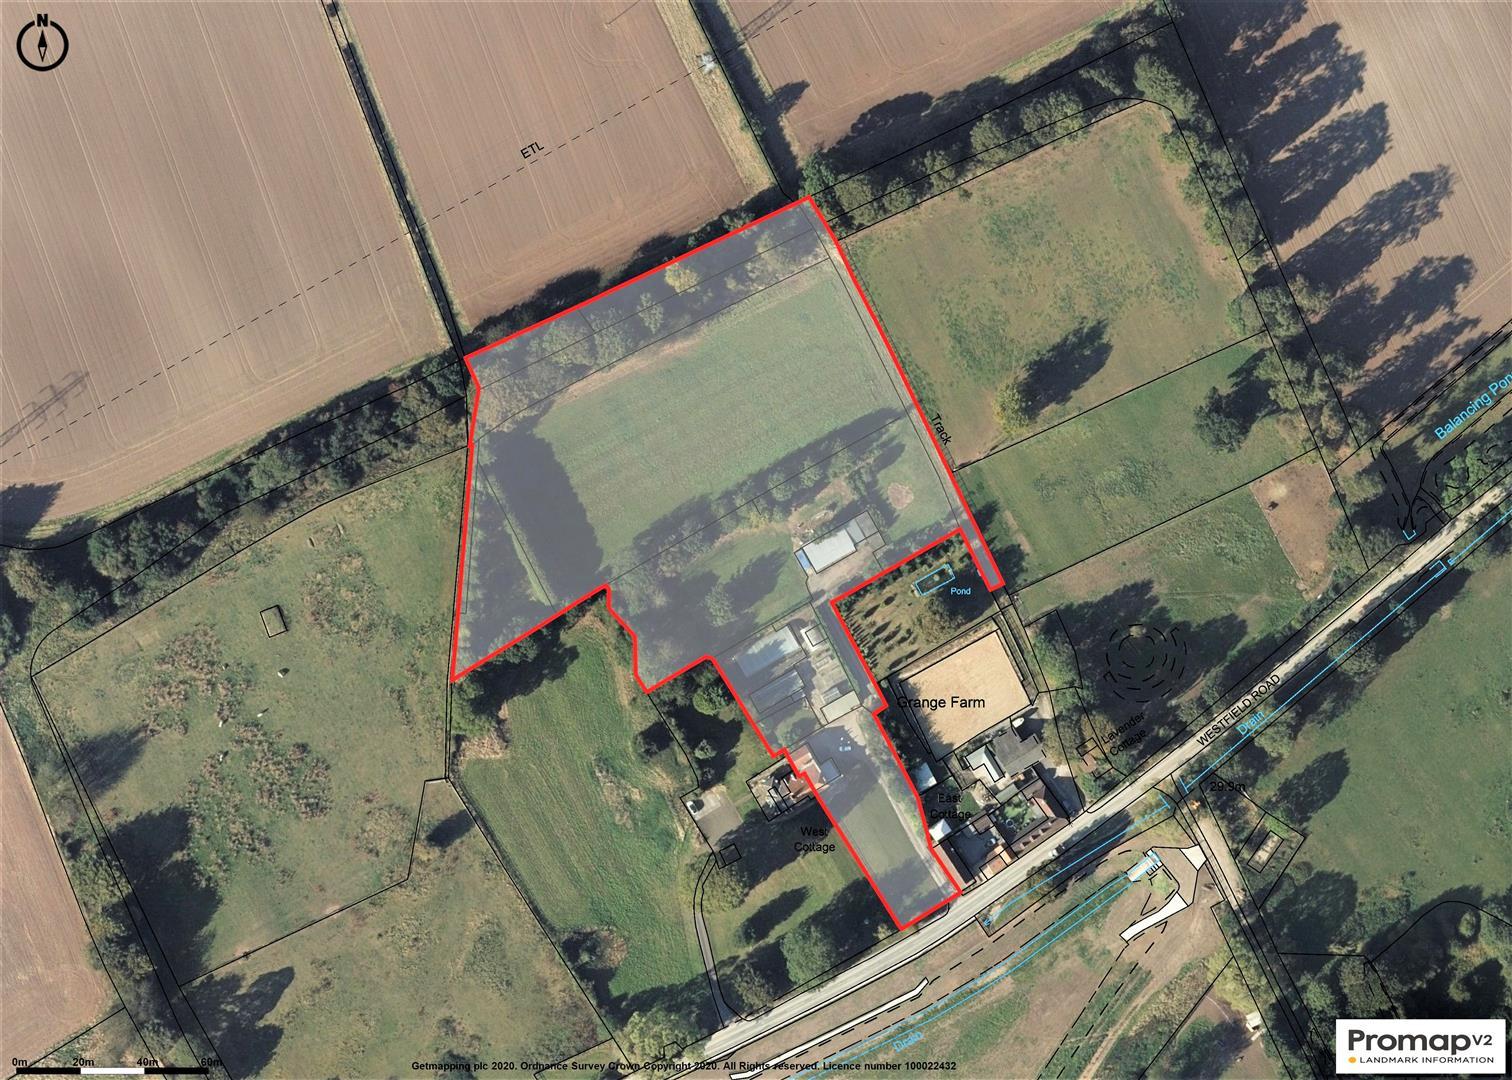 Grange Farm, Westfield Road, Eppleworth, Cottingham, Grange Farm,, HU16 5YJ